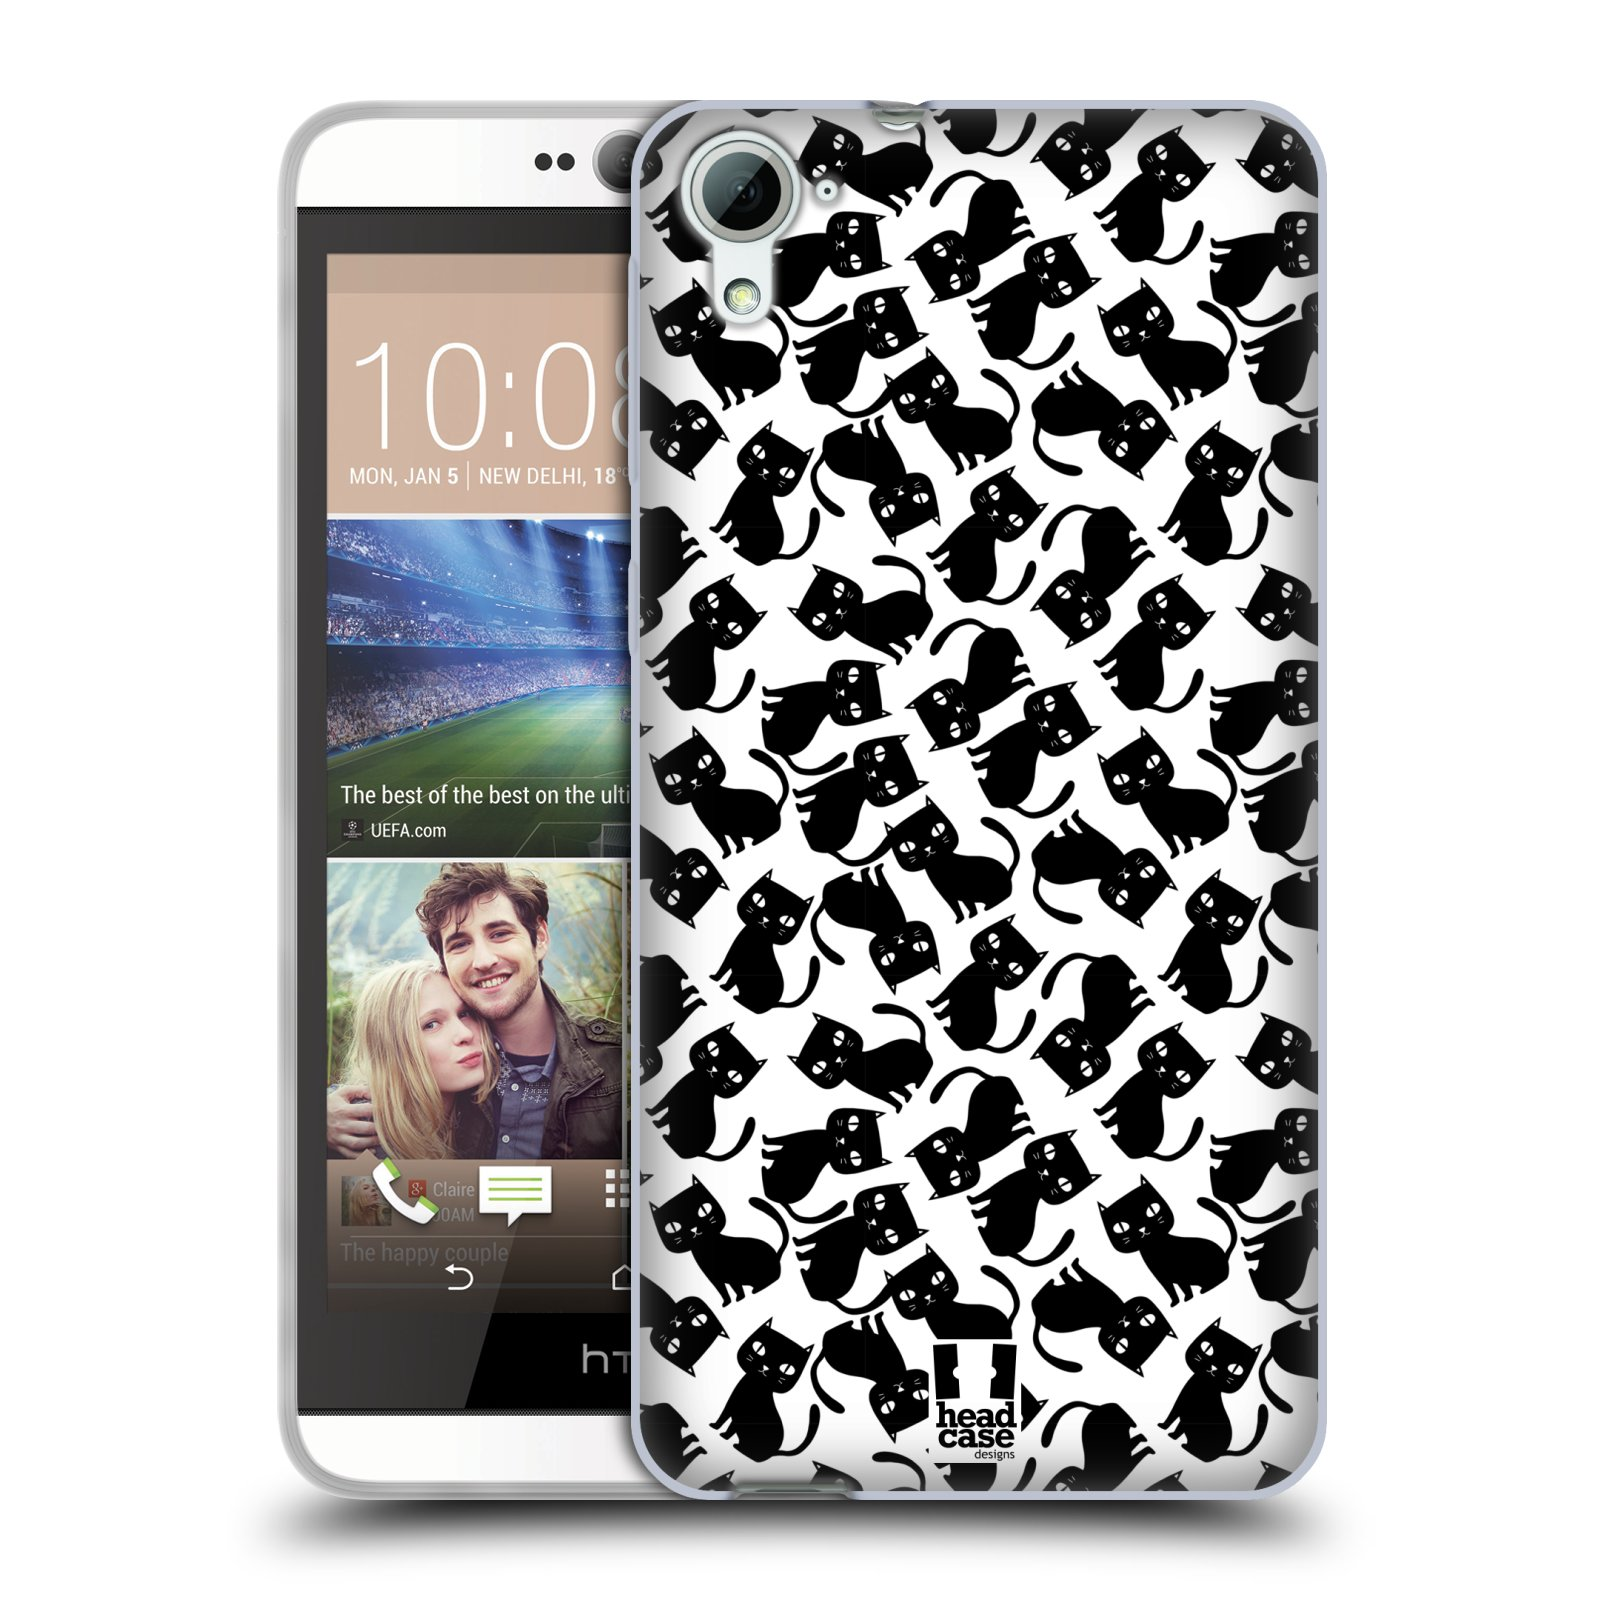 Silikonové pouzdro na mobil HTC Desire 826 HEAD CASE KOČKY Black Pattern (Silikonový kryt či obal na mobilní telefon HTC Desire 826 Dual SIM)